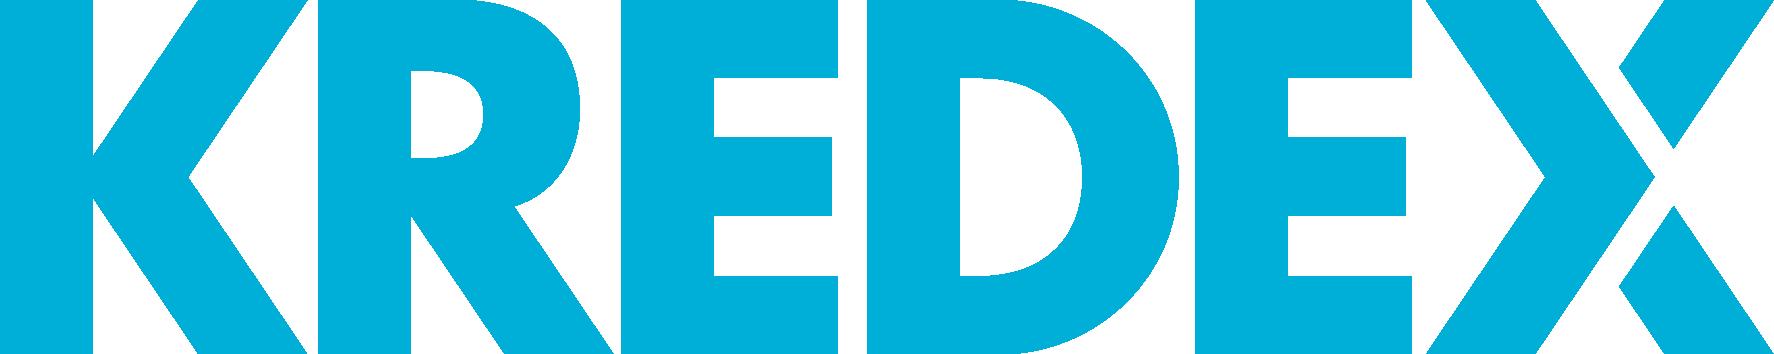 Kredex_logo_blue-1